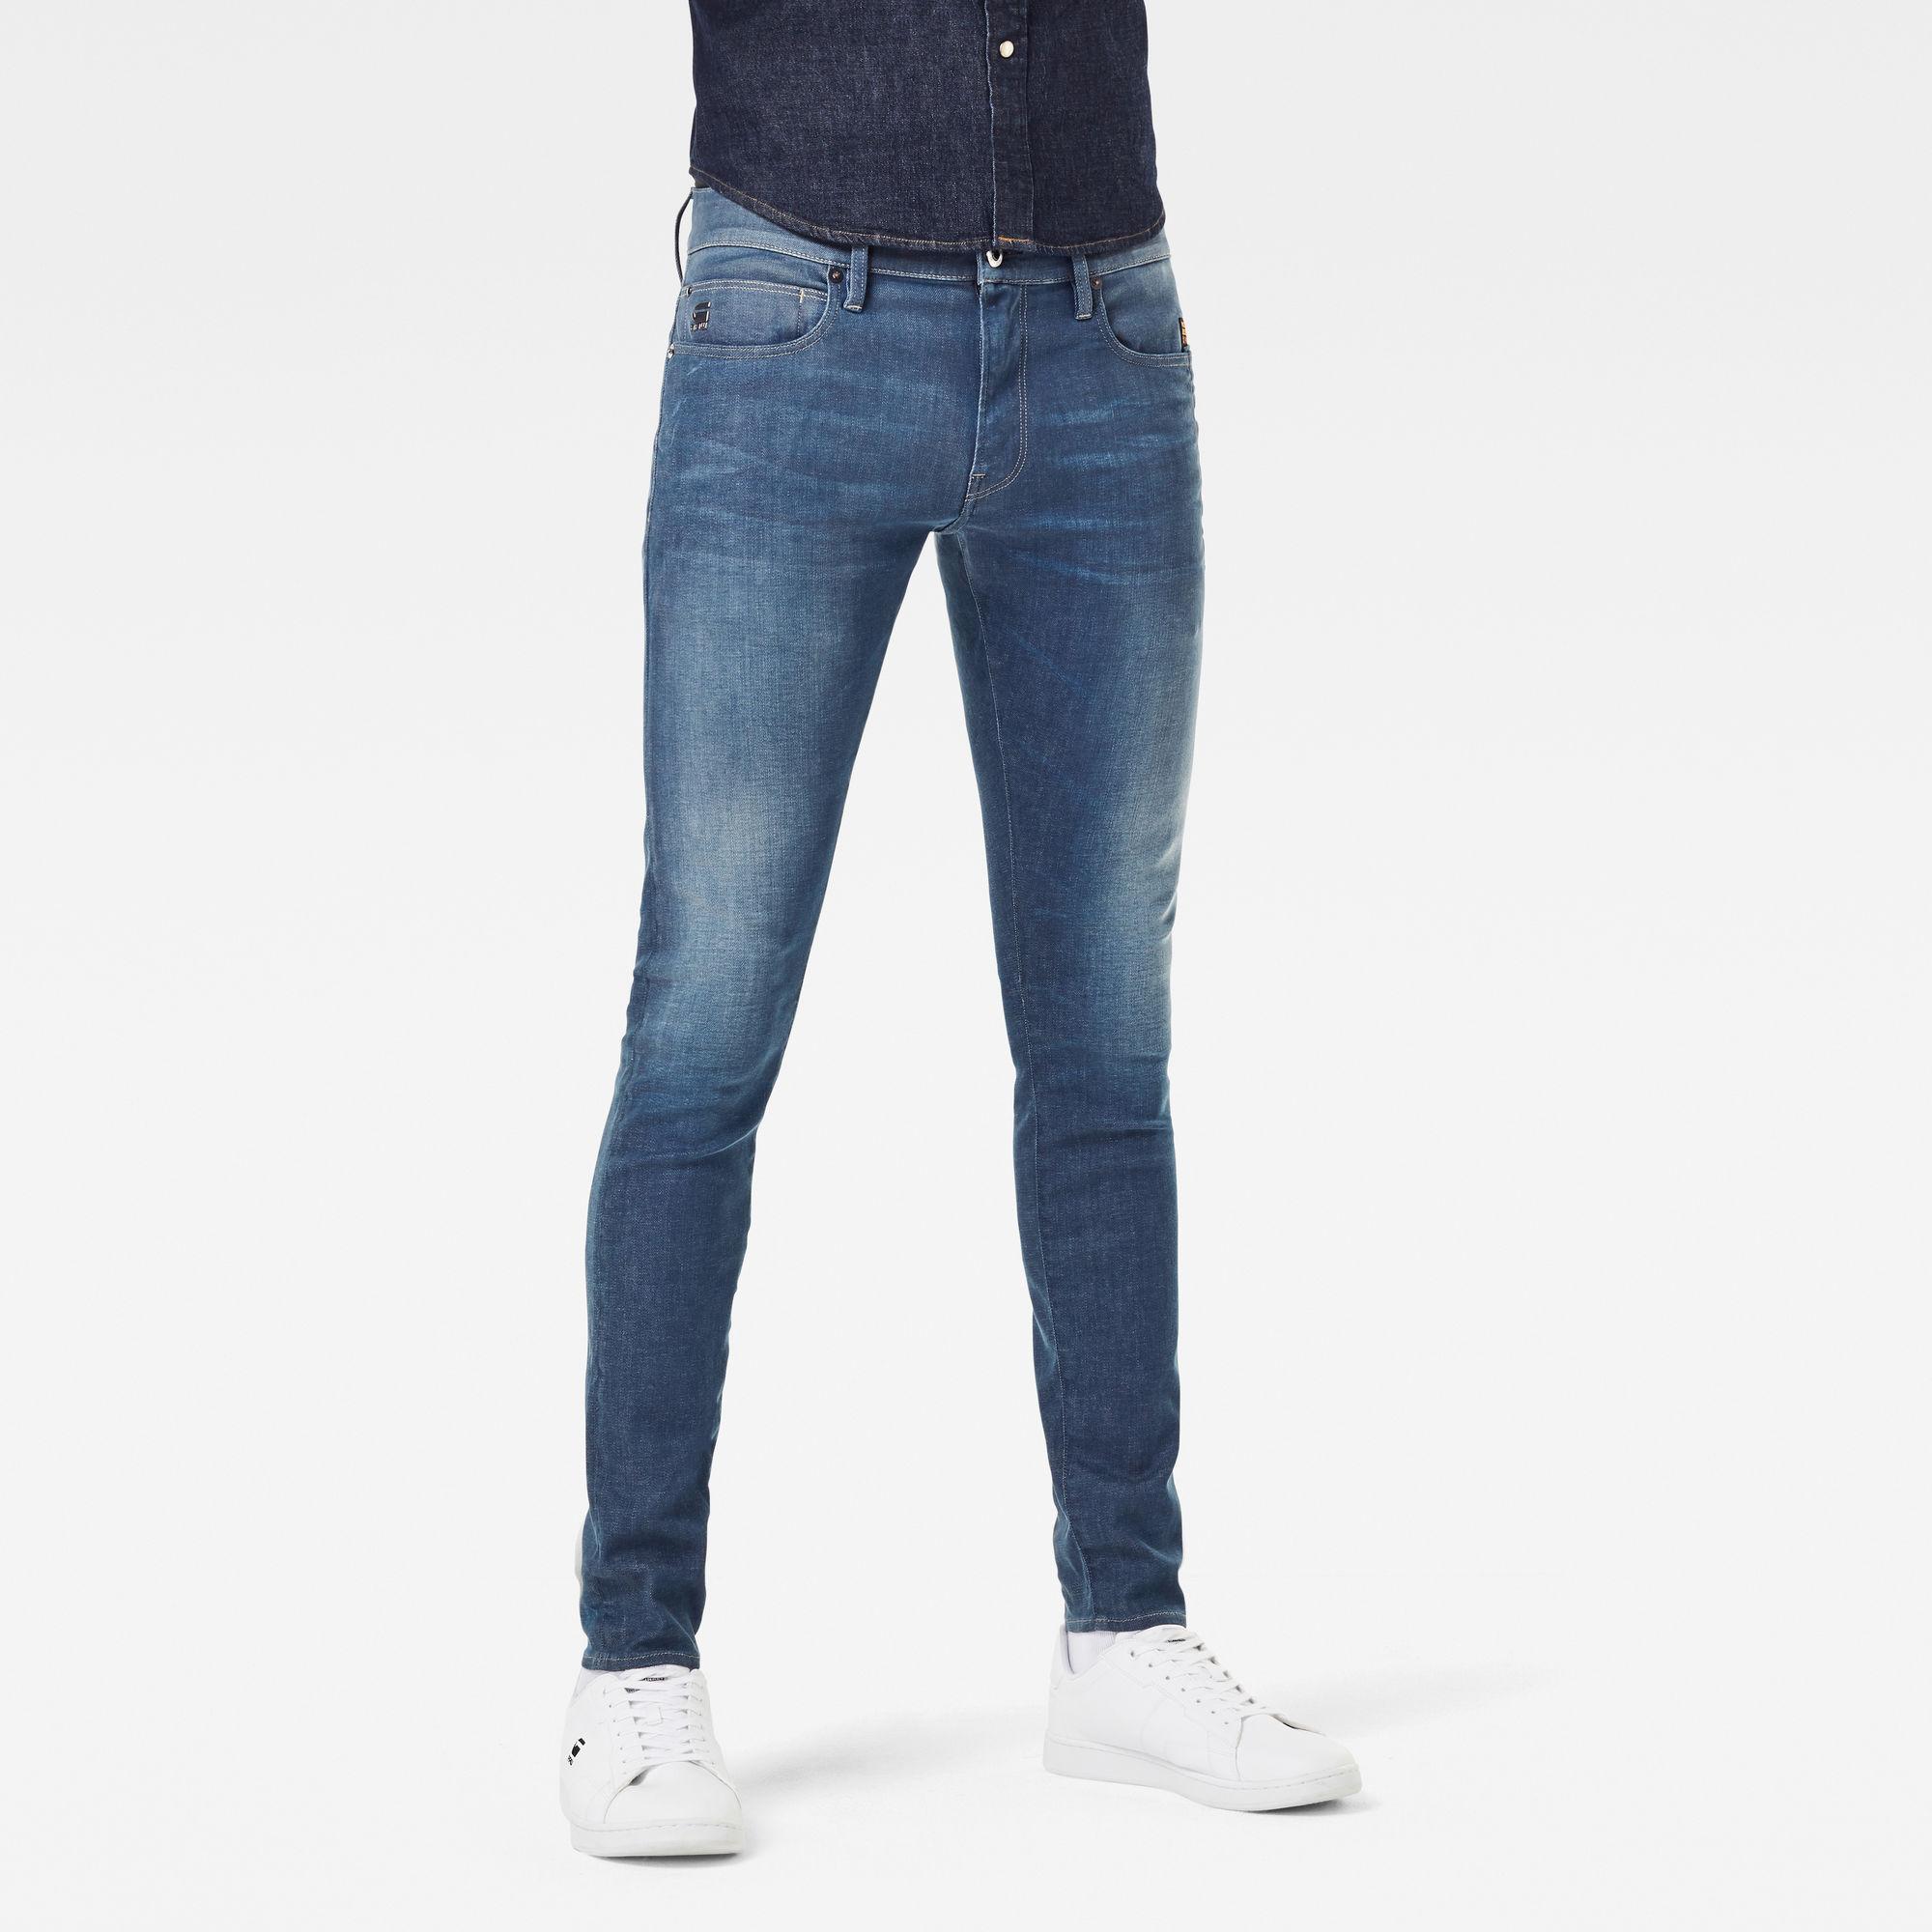 G-Star RAW Heren 4401 Lancet Skinny Jeans Blauw